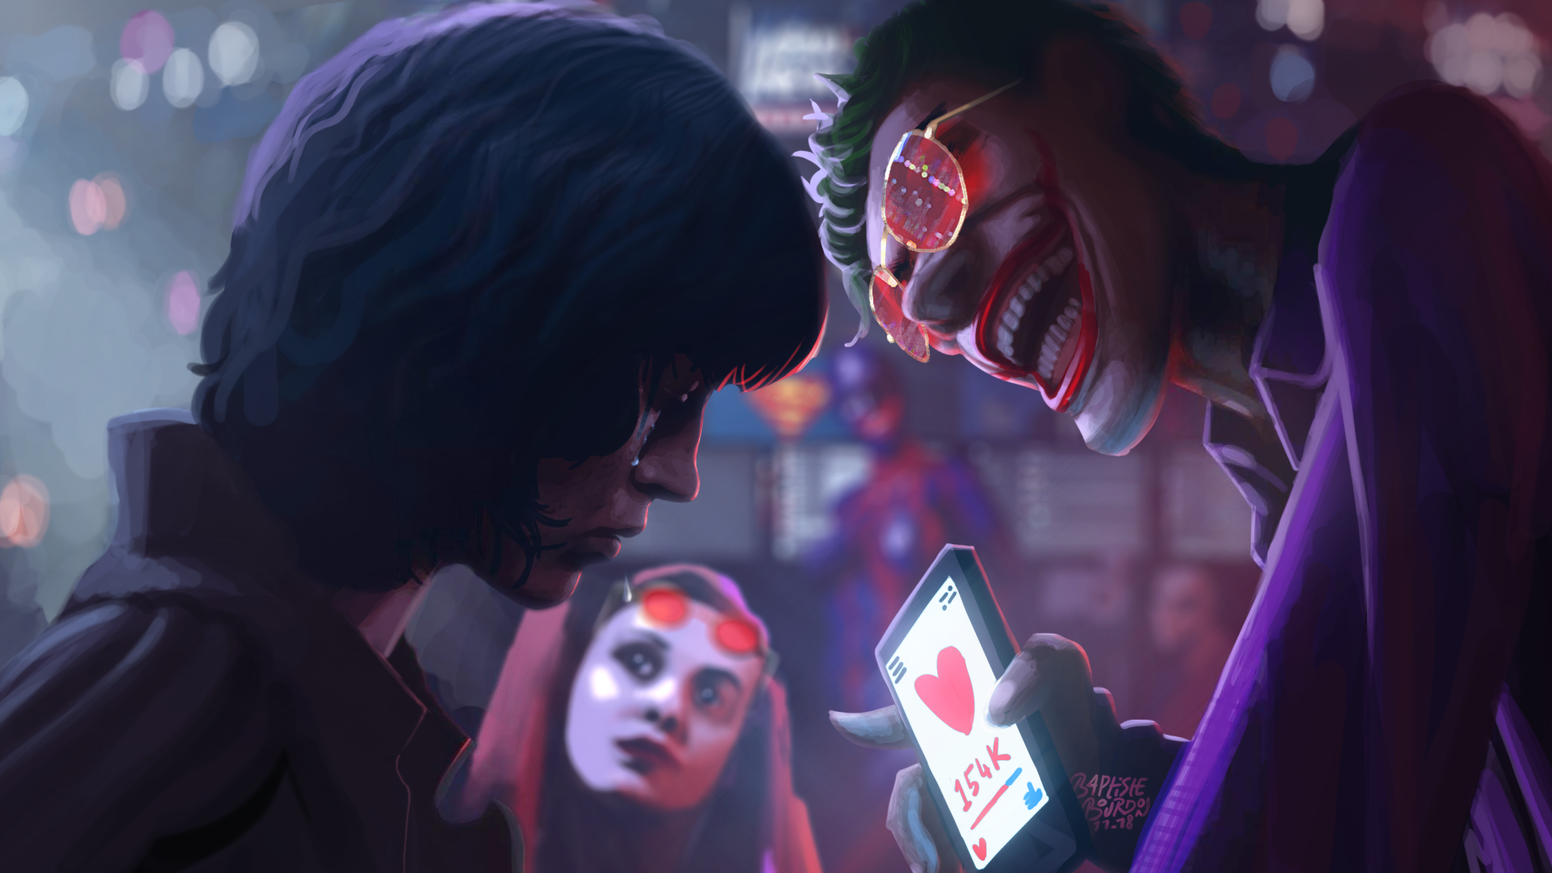 Court-métrage sur l'interview du Joker par la journaliste Lois Lane. #fakenews #press #medias #hacking #loislane #joker #socialmedia